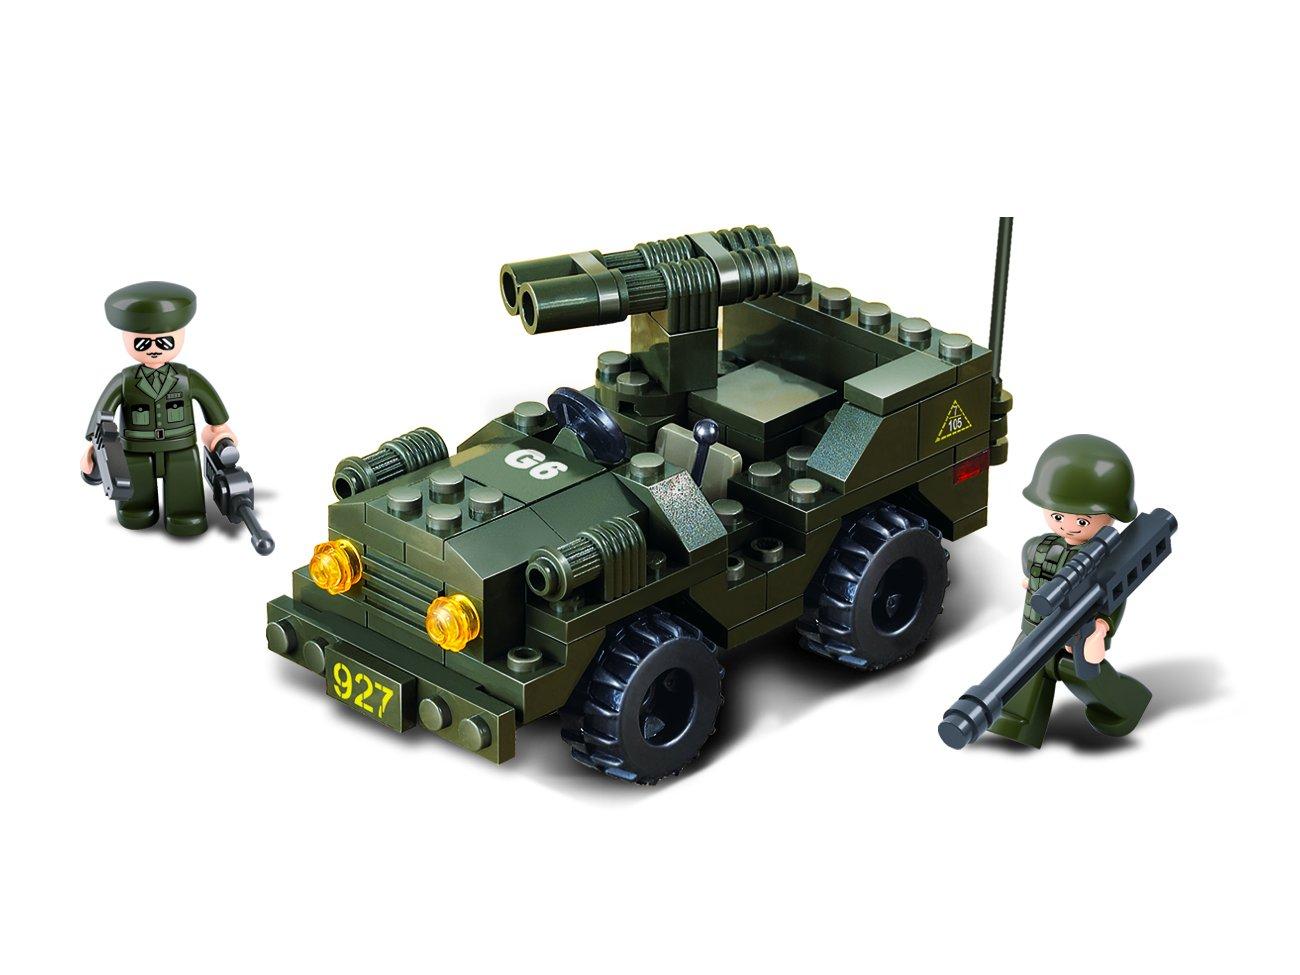 102 Pieces Sluban Jeep Army Building Kit